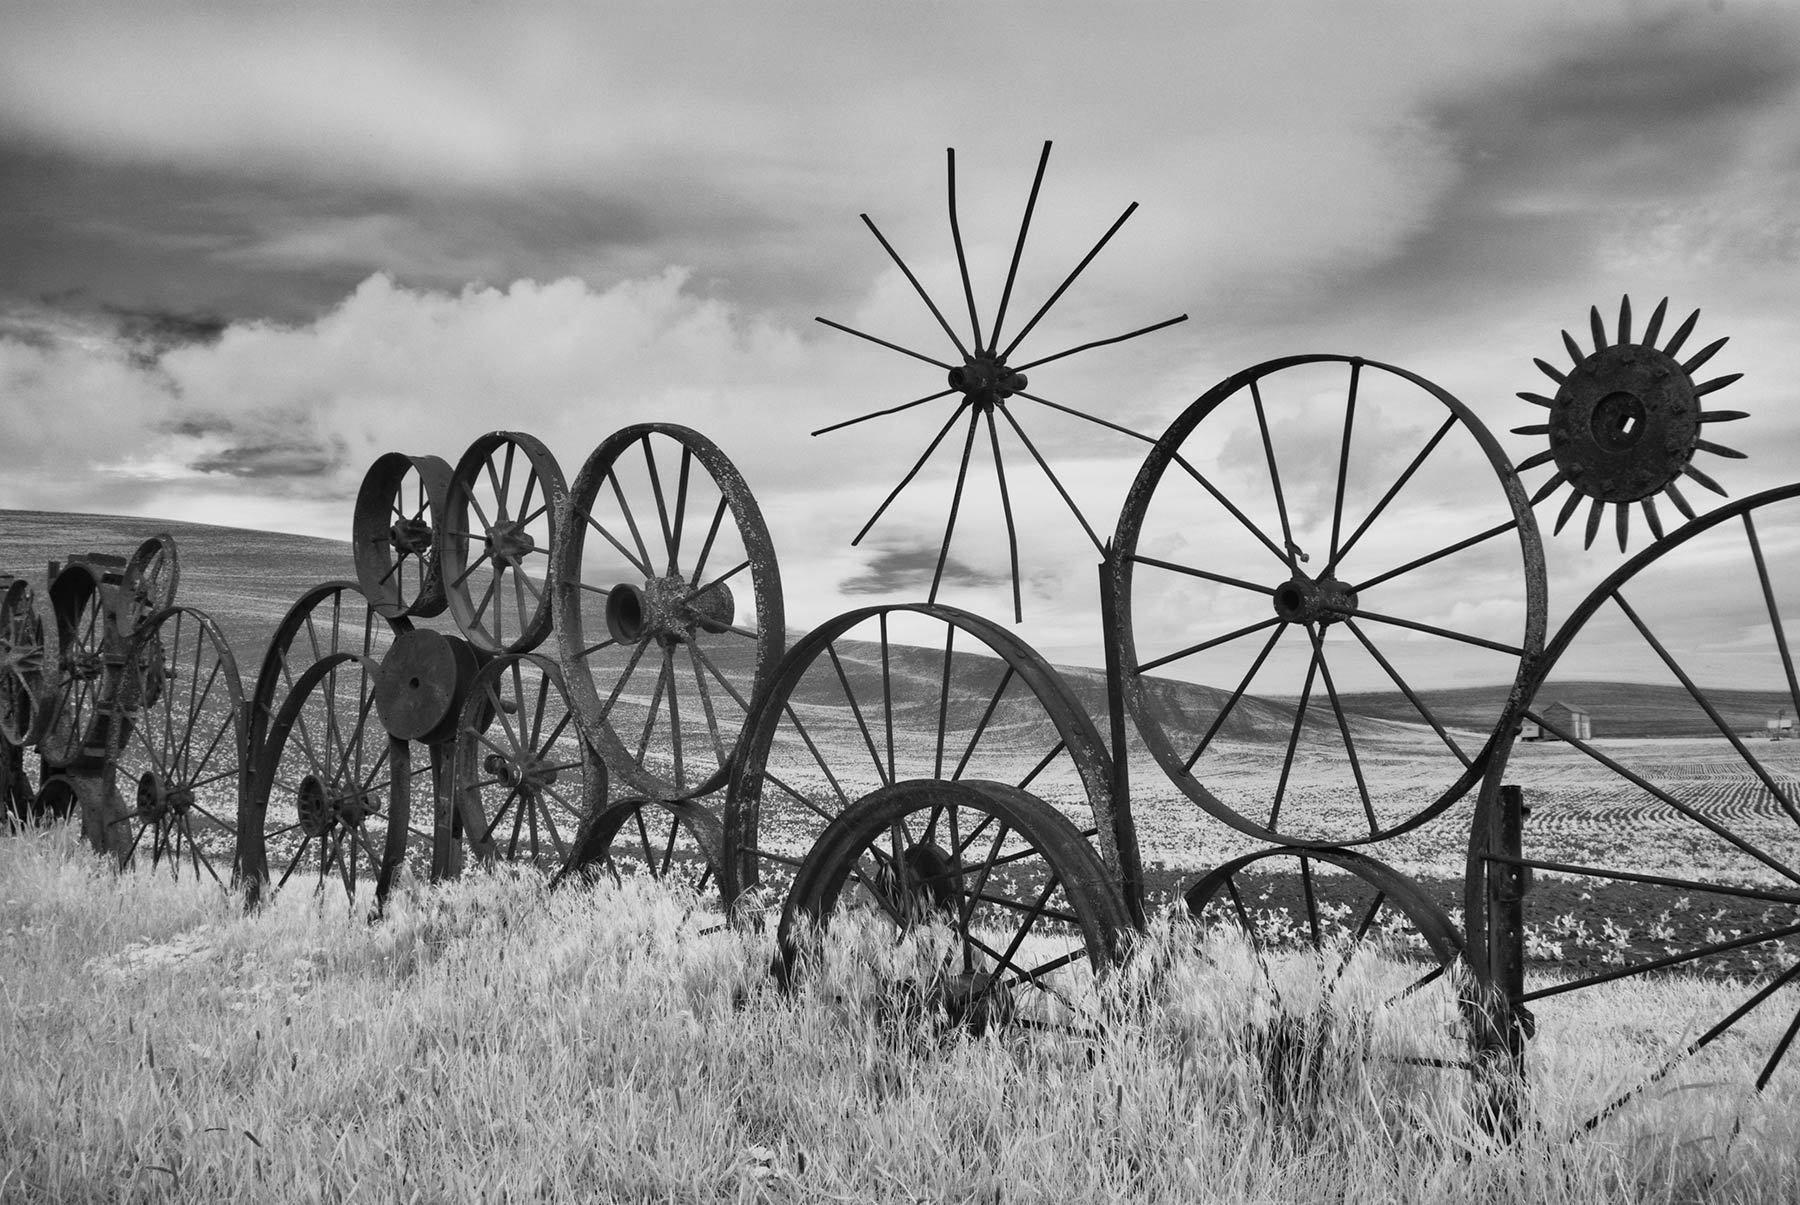 1wheel_fence_2.jpg